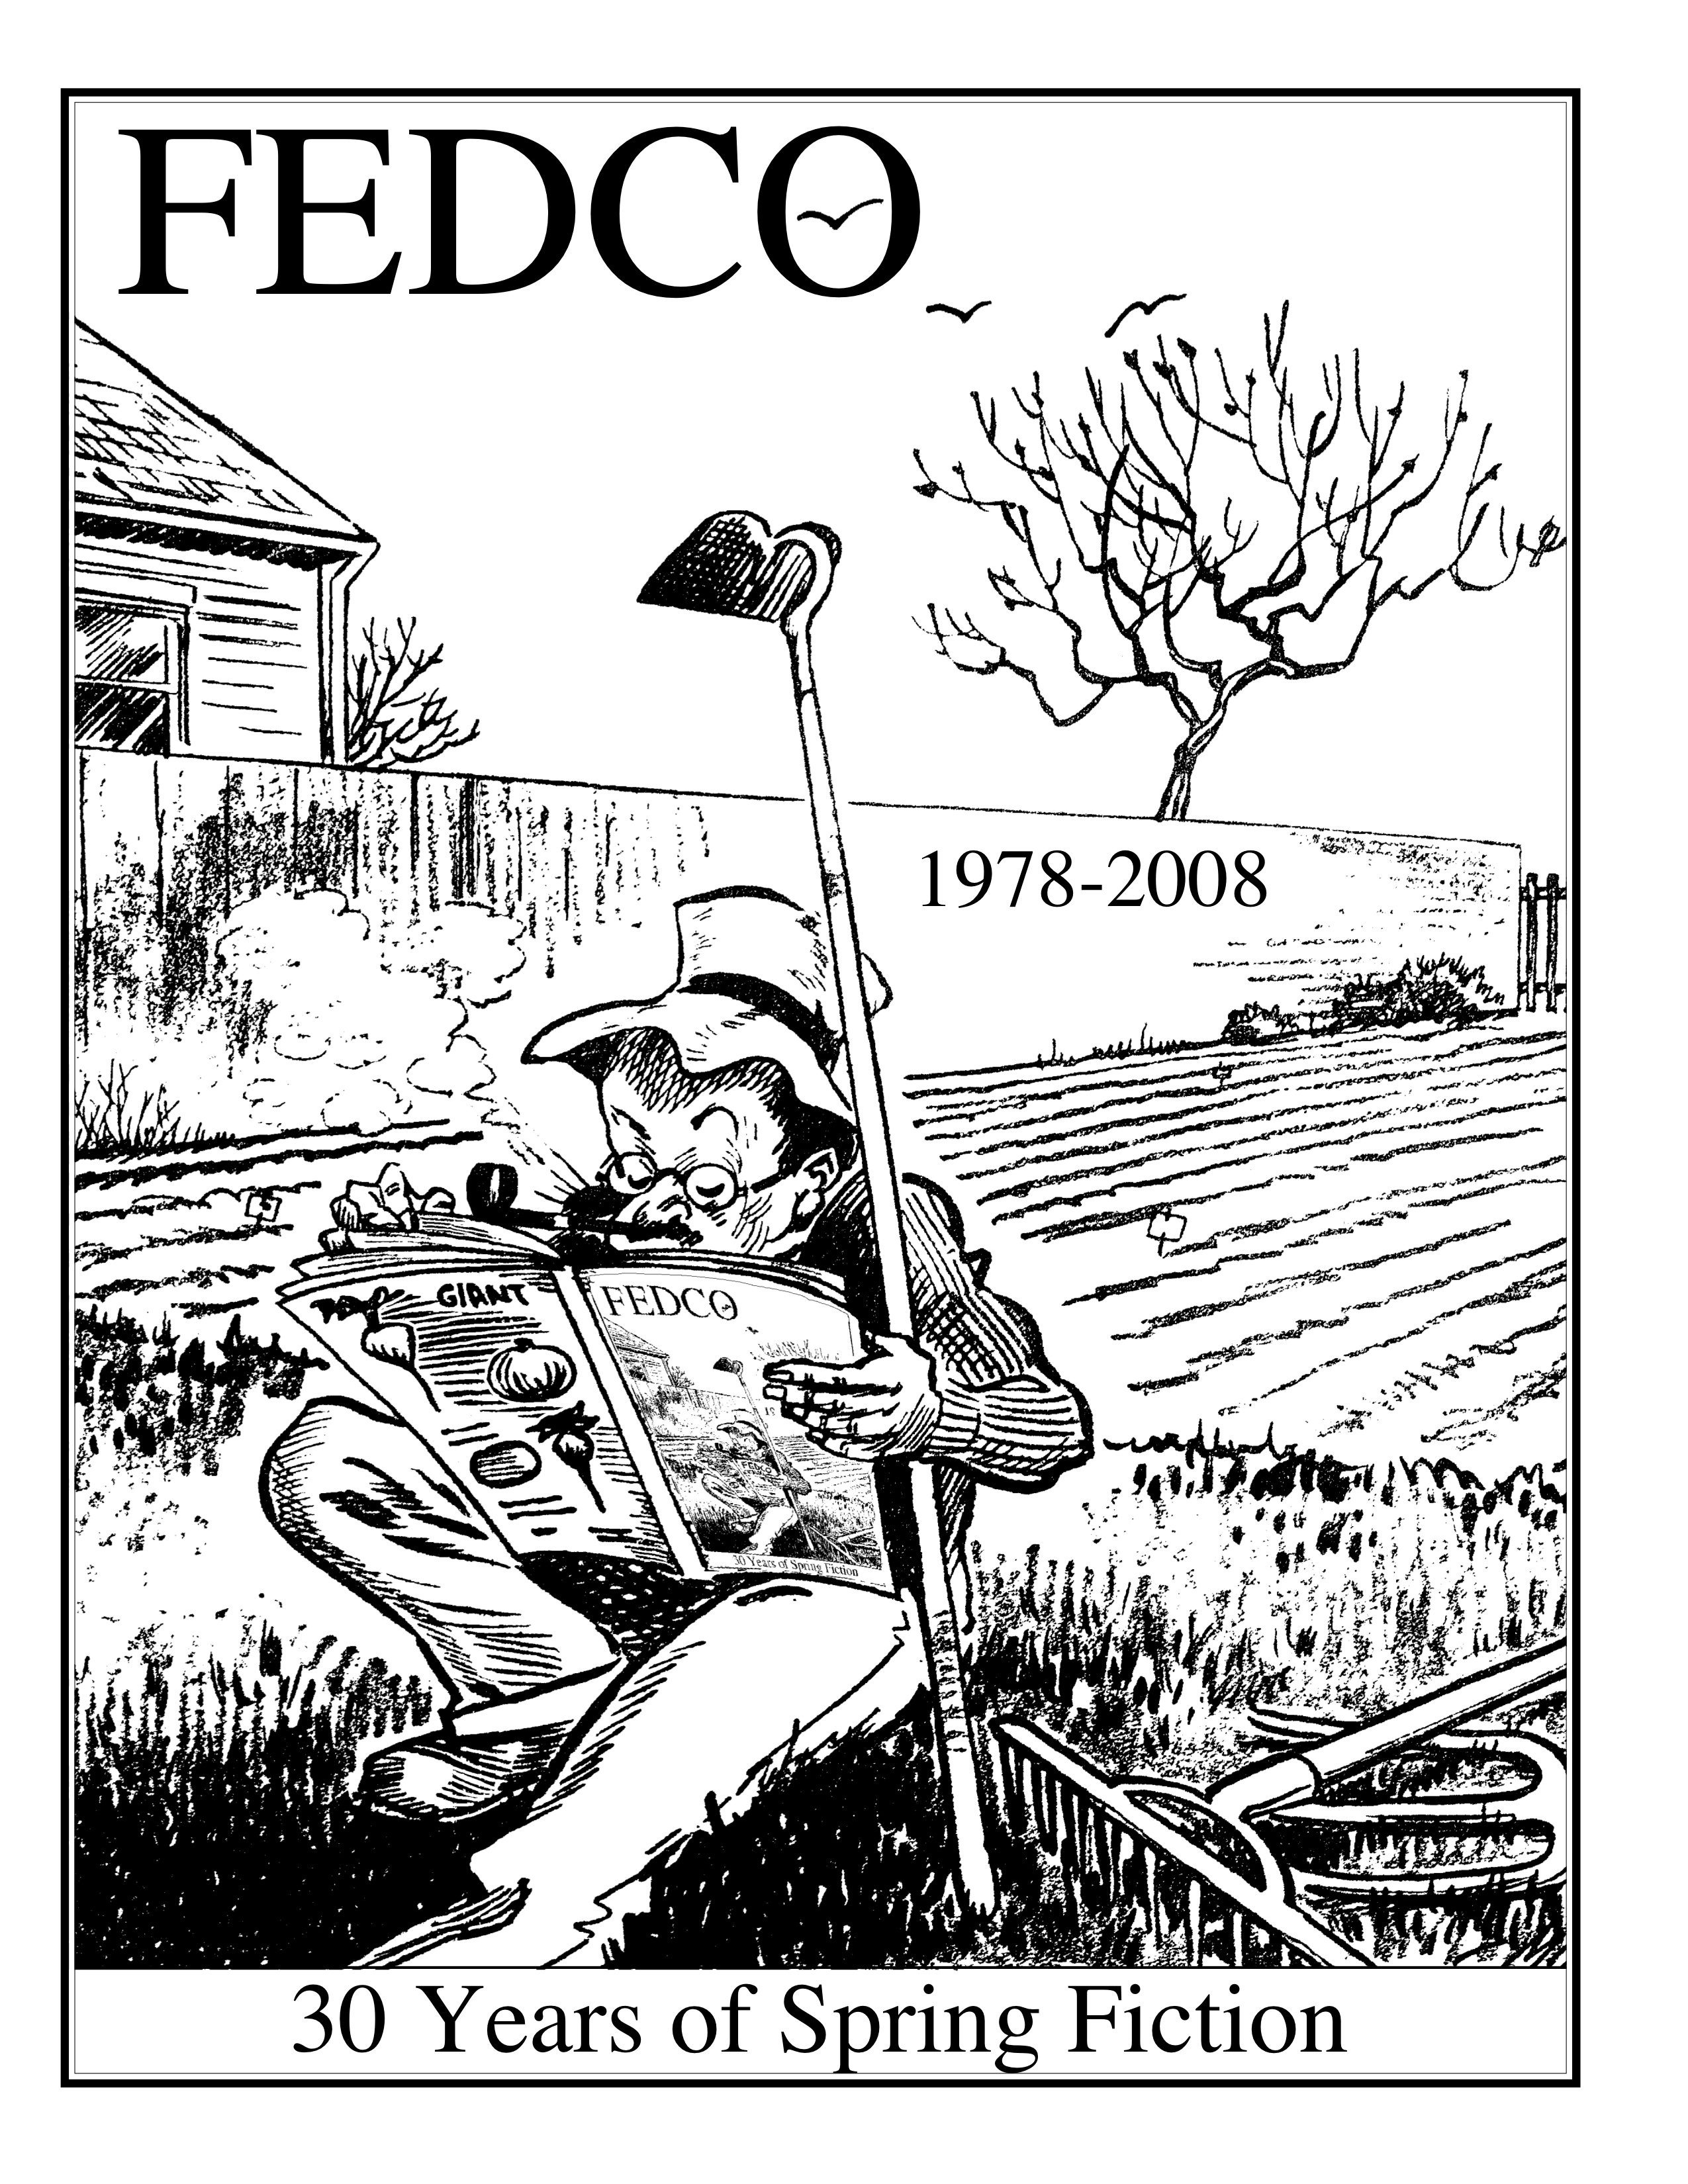 Exhibit of the FEDCO SEED CATALOG (Farmington)